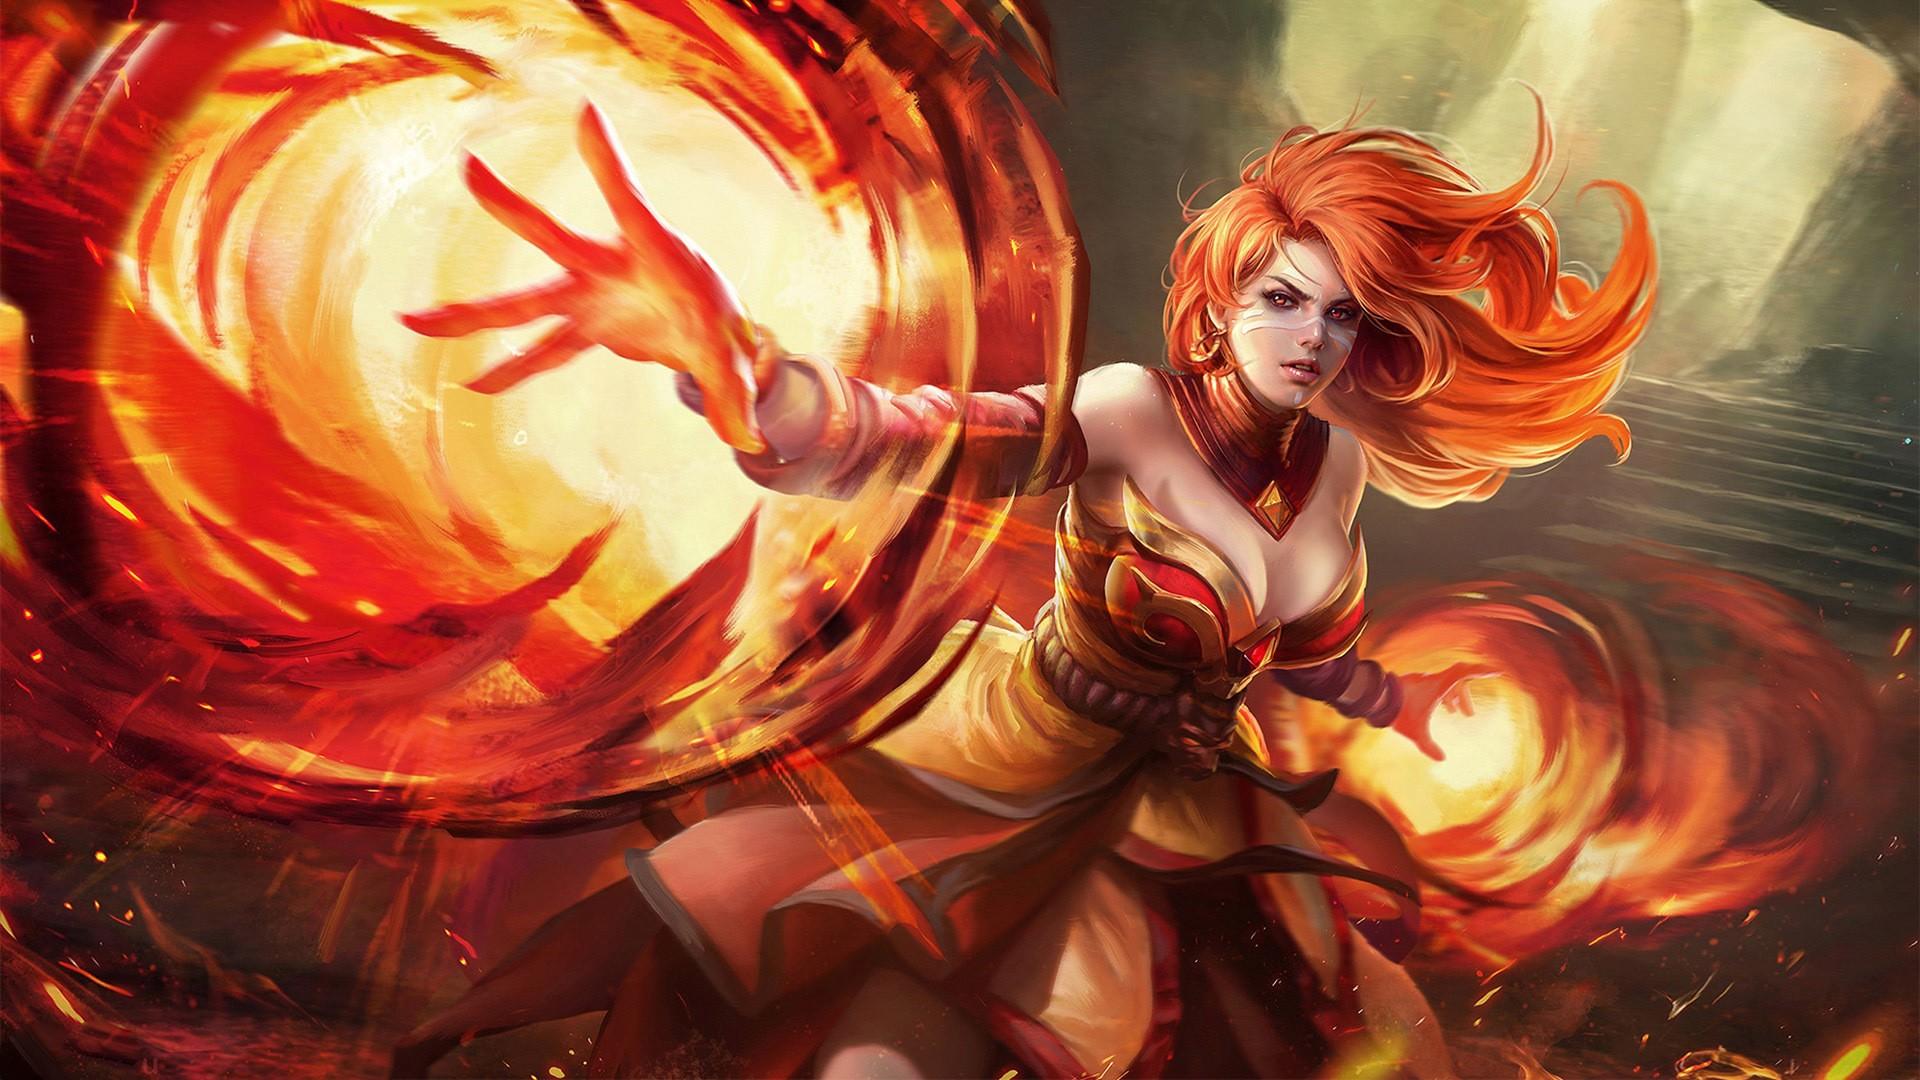 Dota 2 Video Game Fantasy Art, Hd Games, 4K Wallpapers -1499